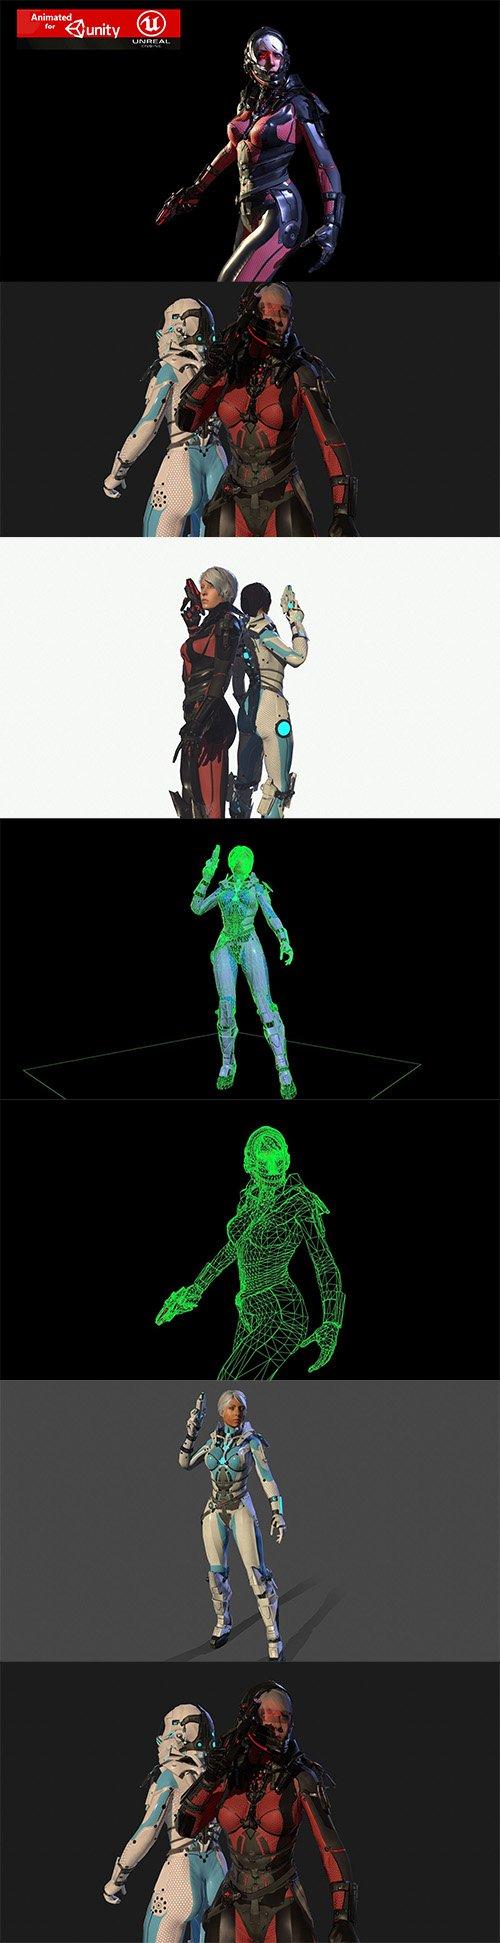 Sci Fy Girl Low-poly 3D model